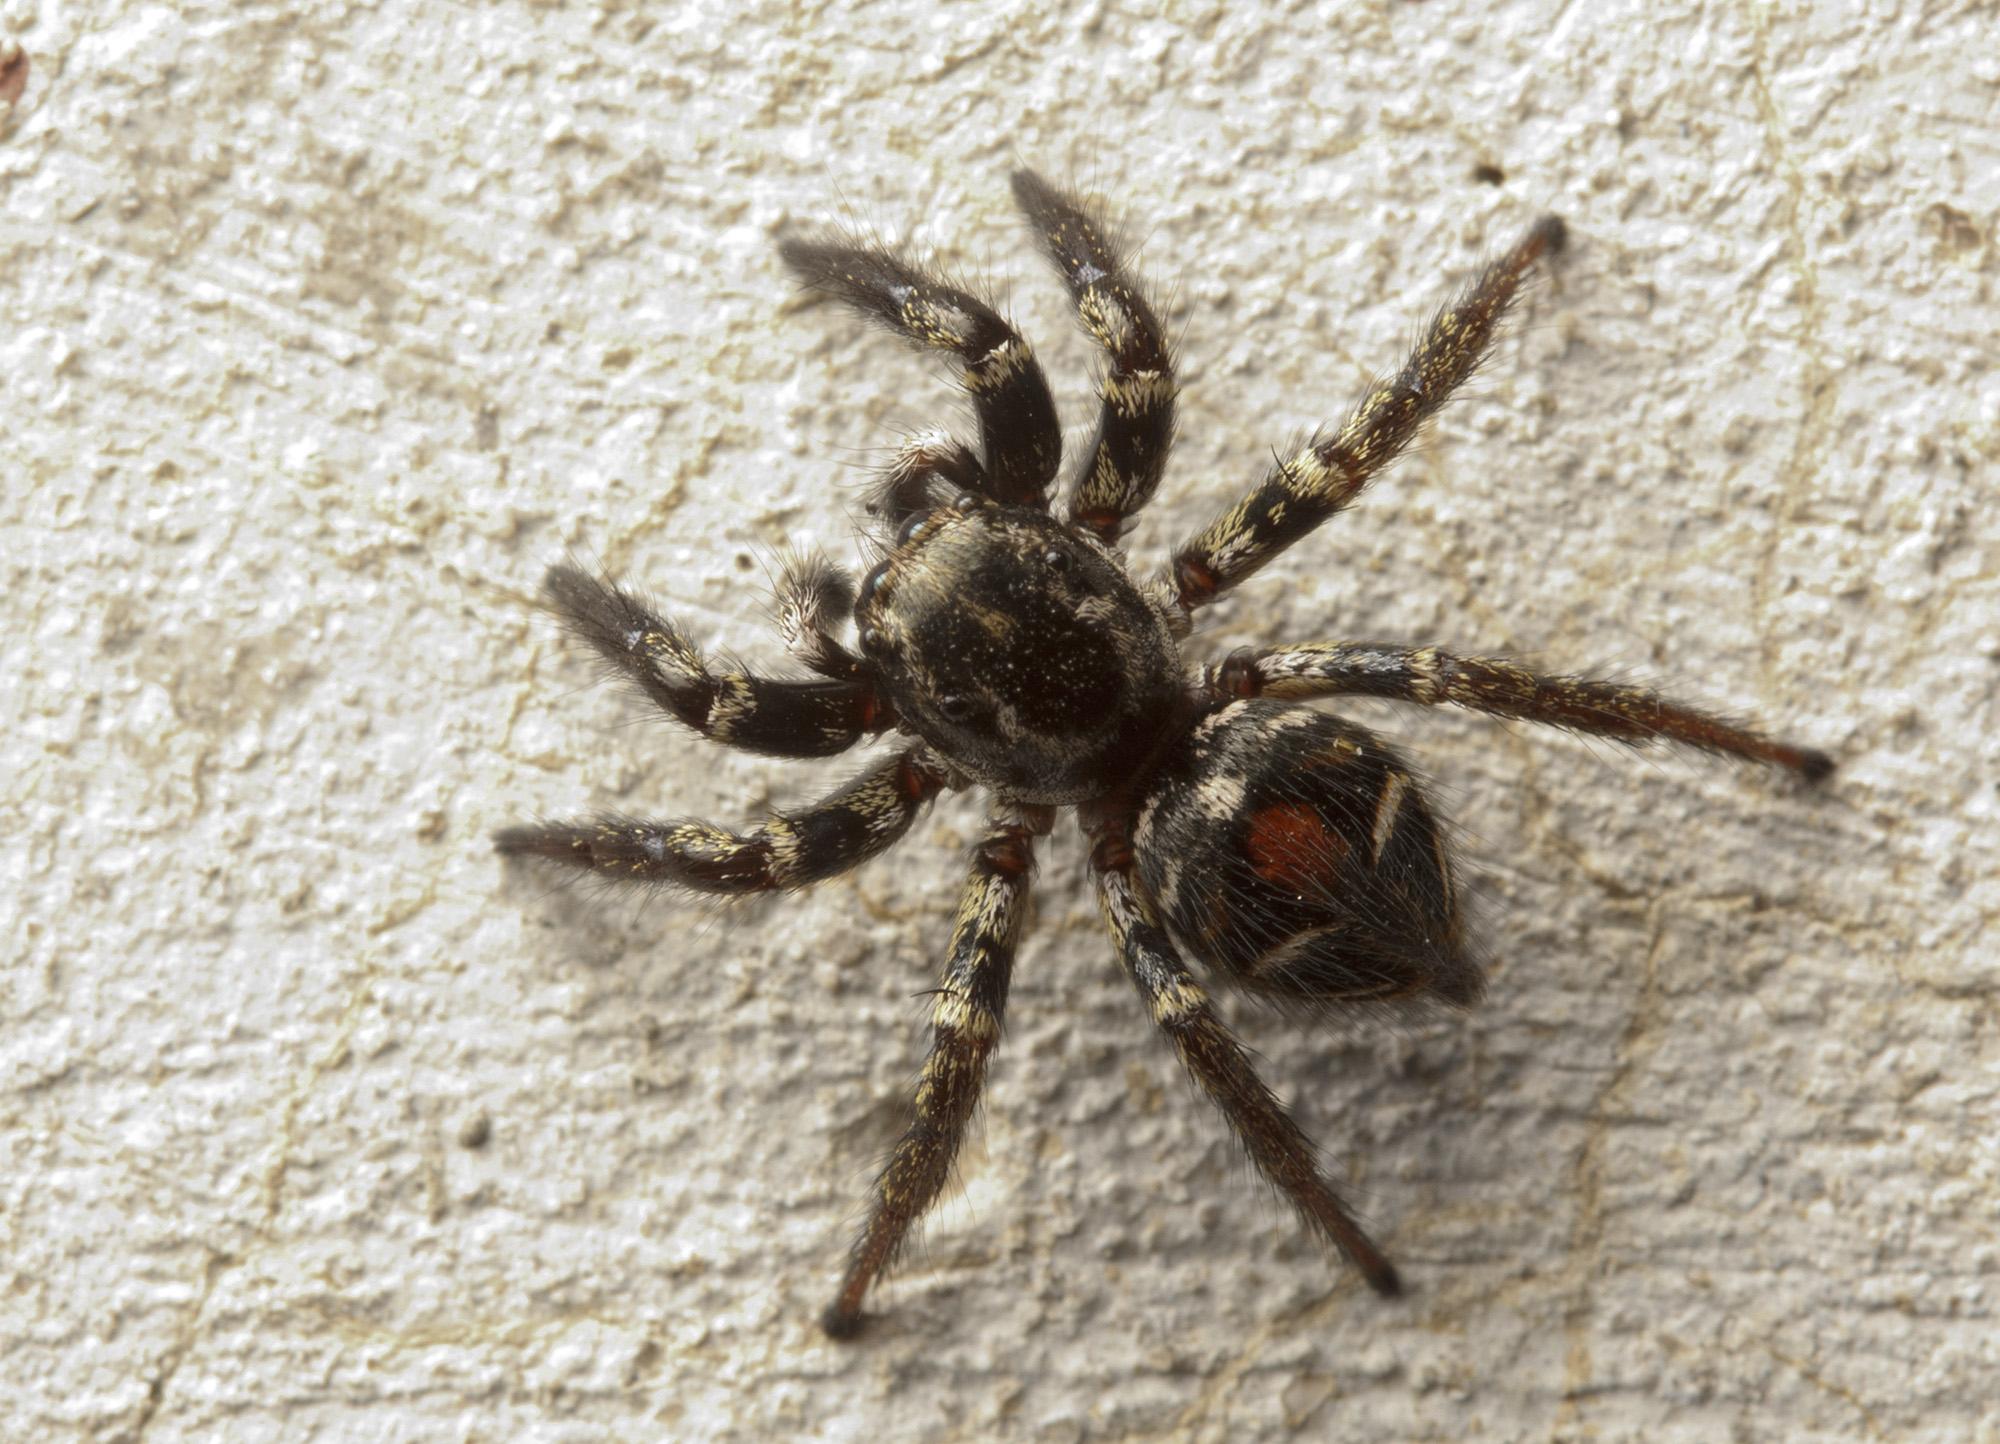 Salticidae | spiderbytes